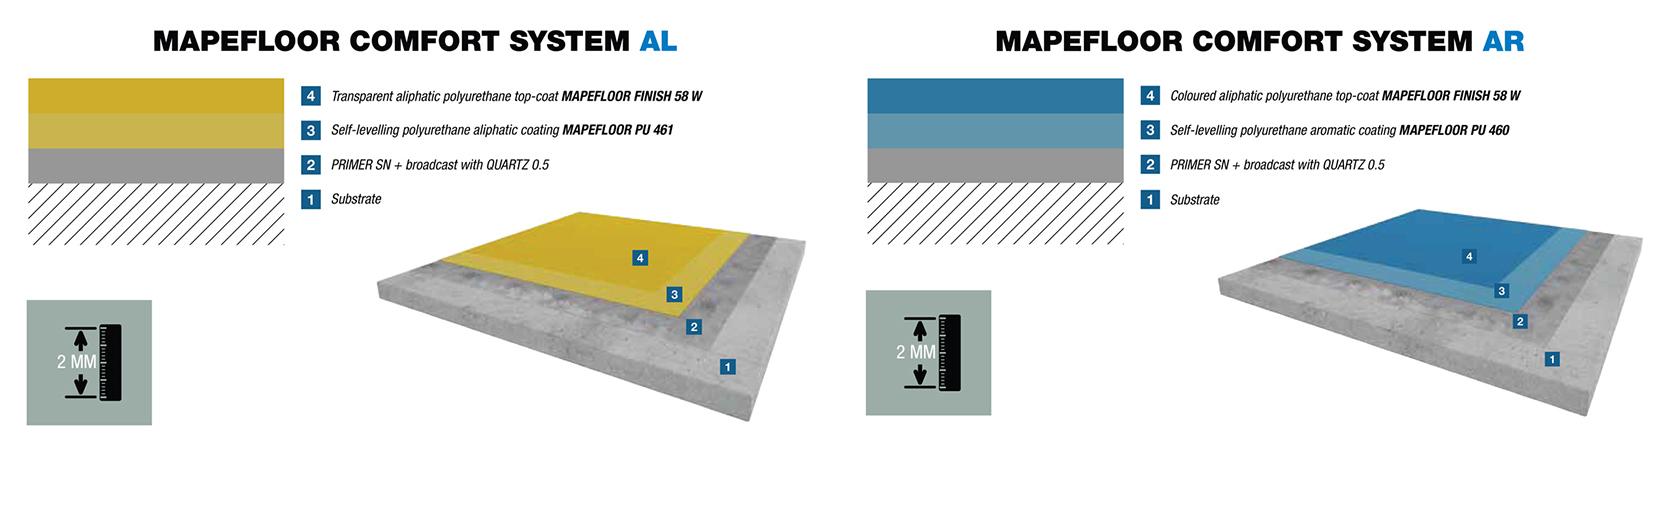 Mapefloor-comfort-system-ALX